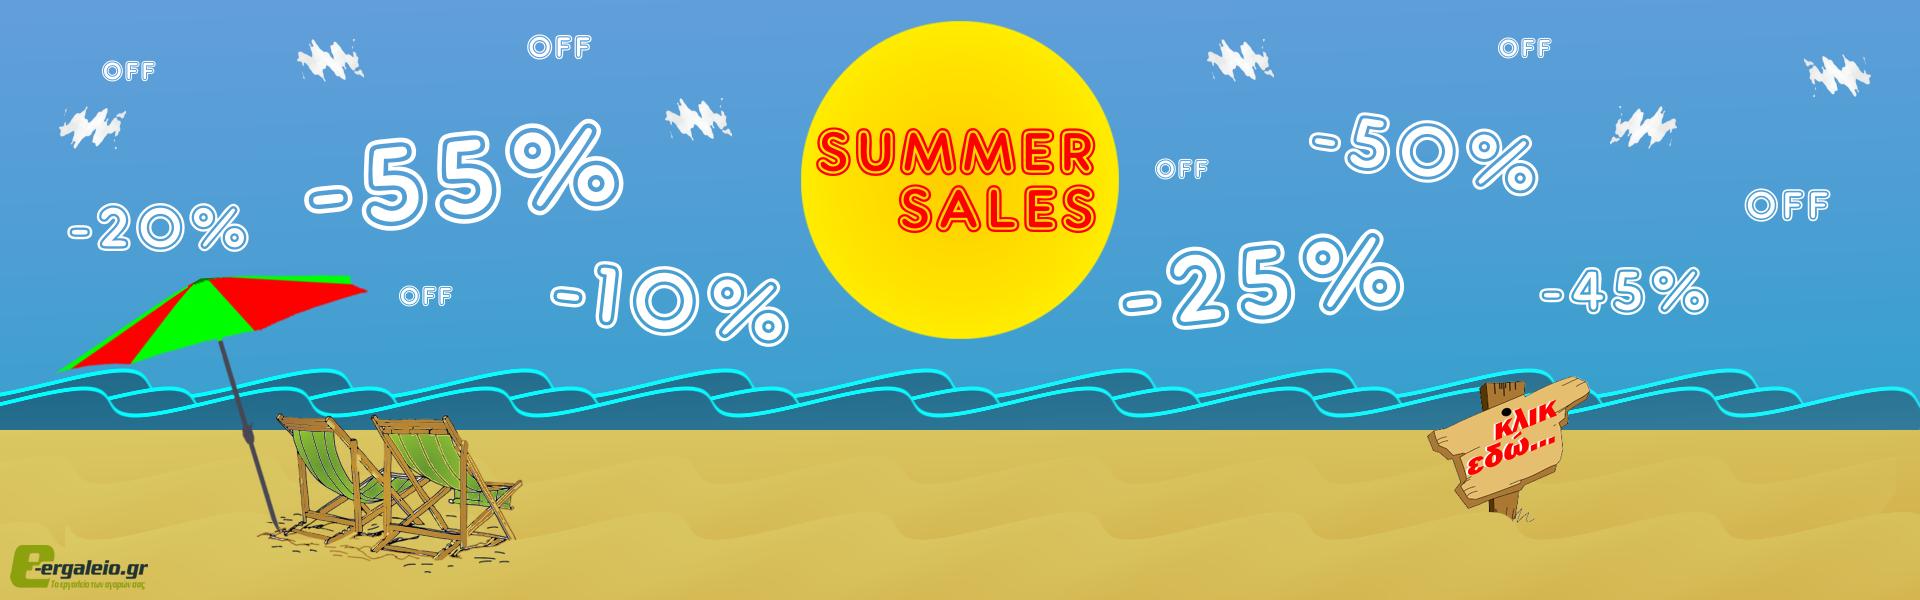 Summer Sales!!! Κάνε κλικ και δες όλες τις προσφορές έως -55%...